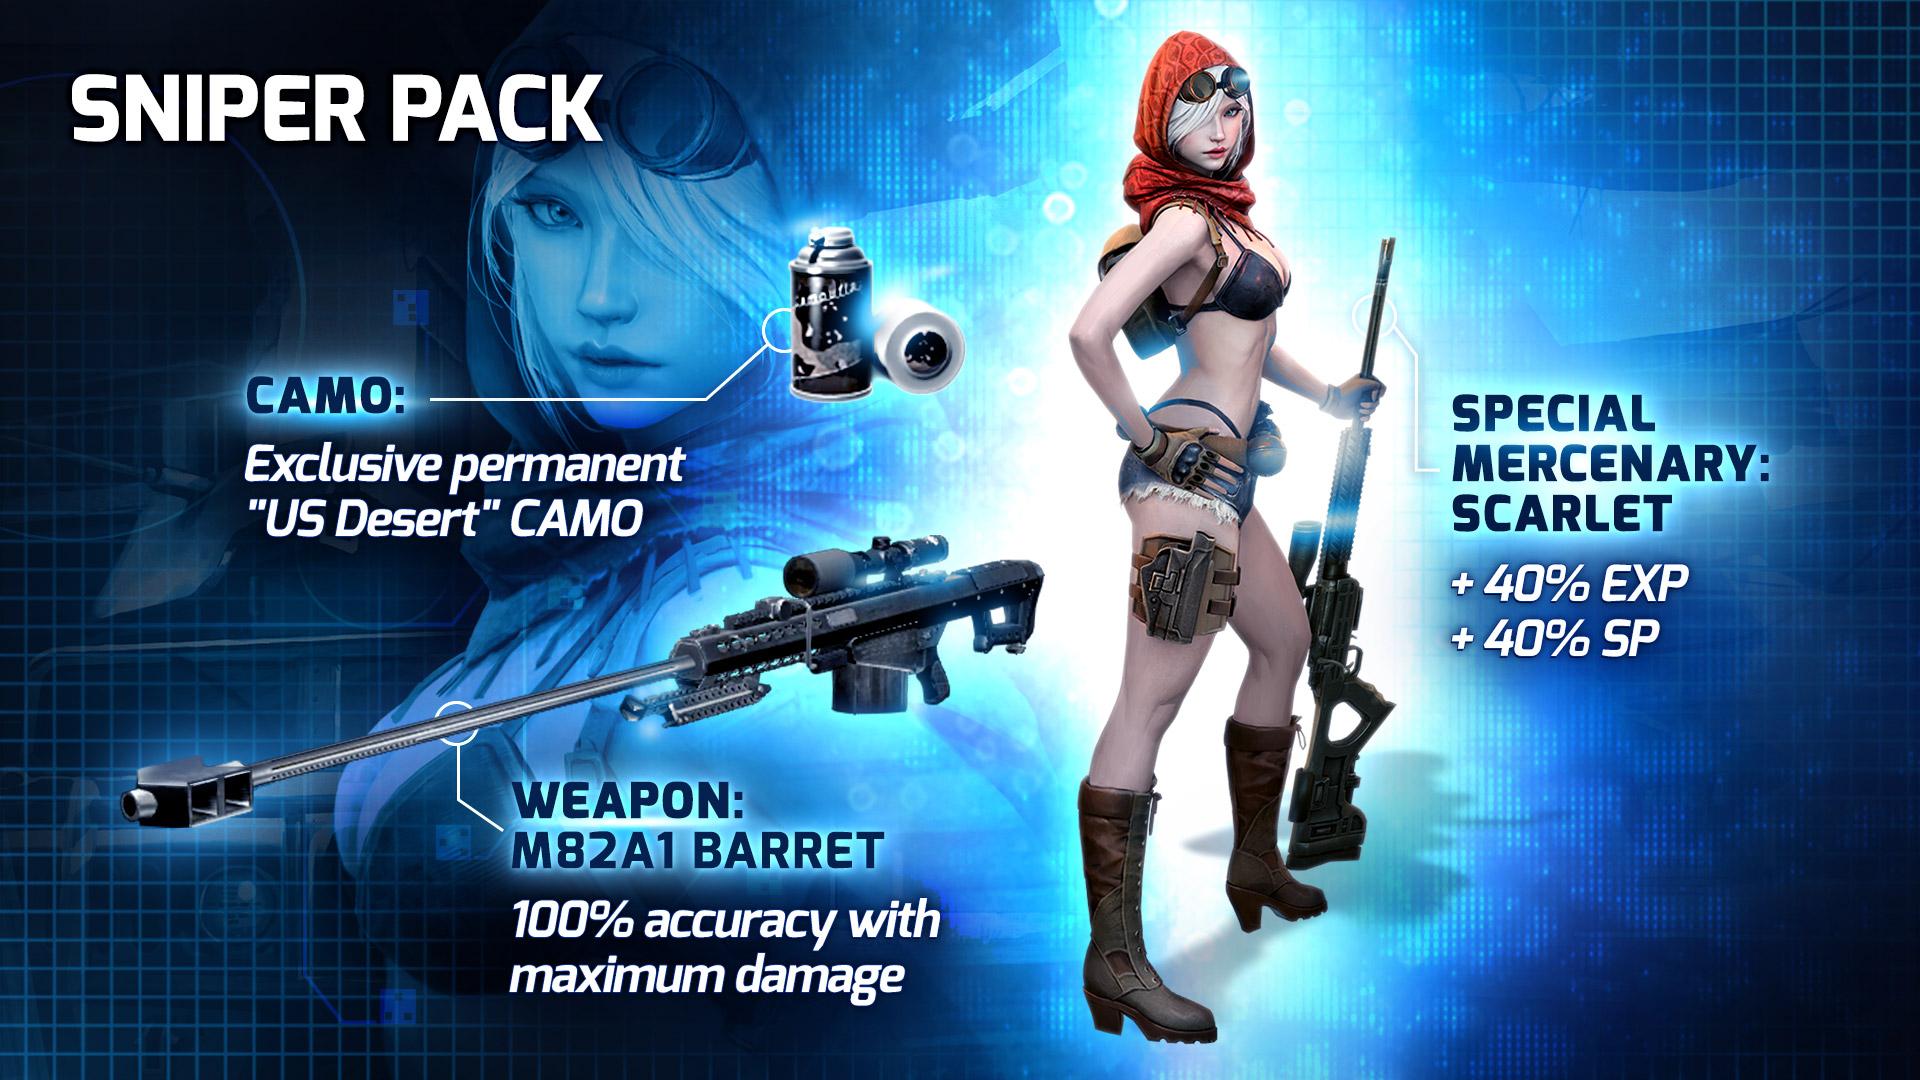 S.K.I.L.L.: Sniper Pack 2017 pc game Img-1